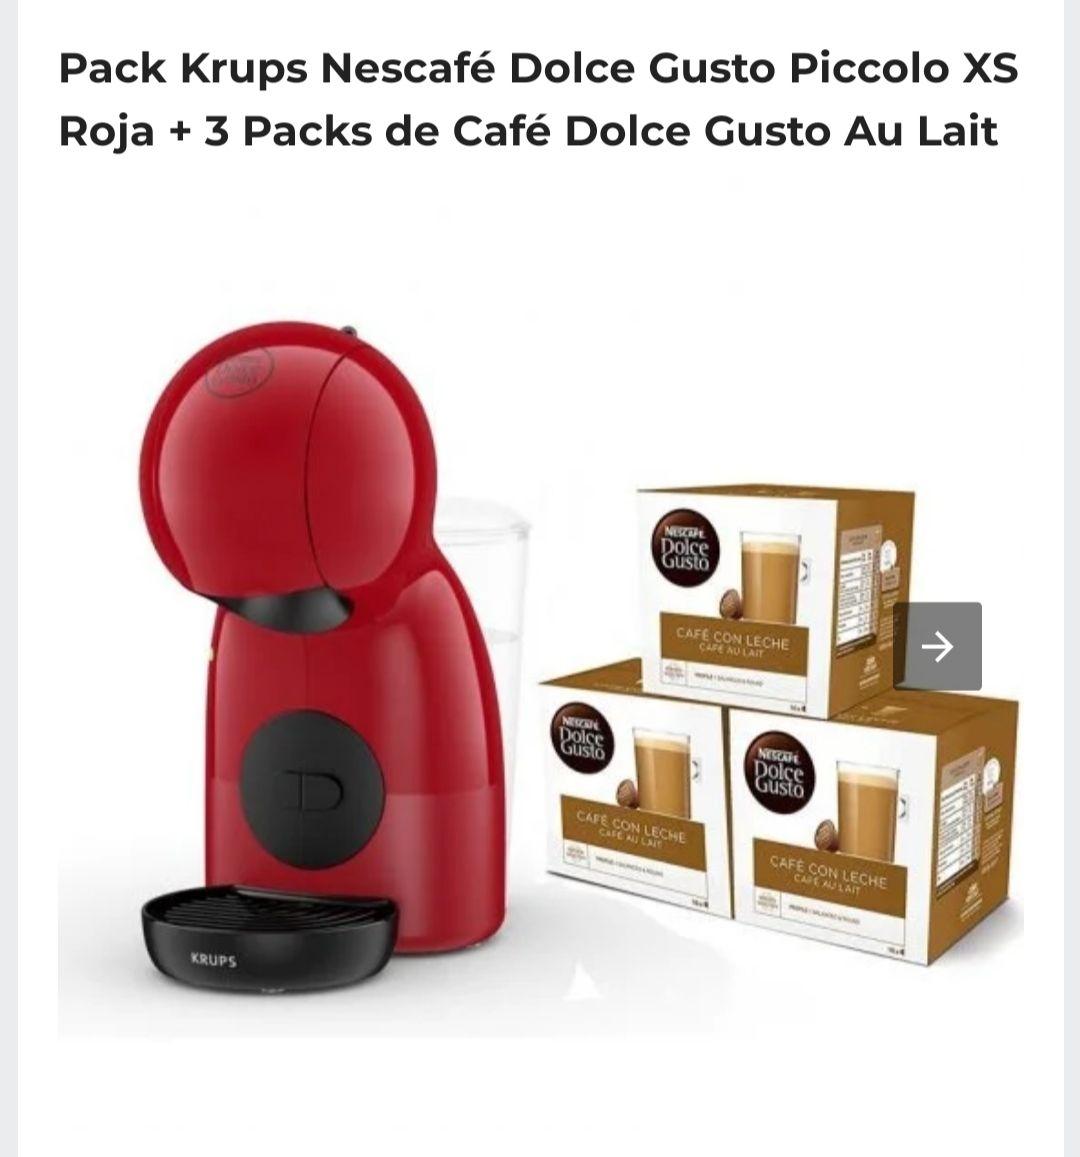 Cafetera+Pack cápsulas Nescafé Dolce Gusto